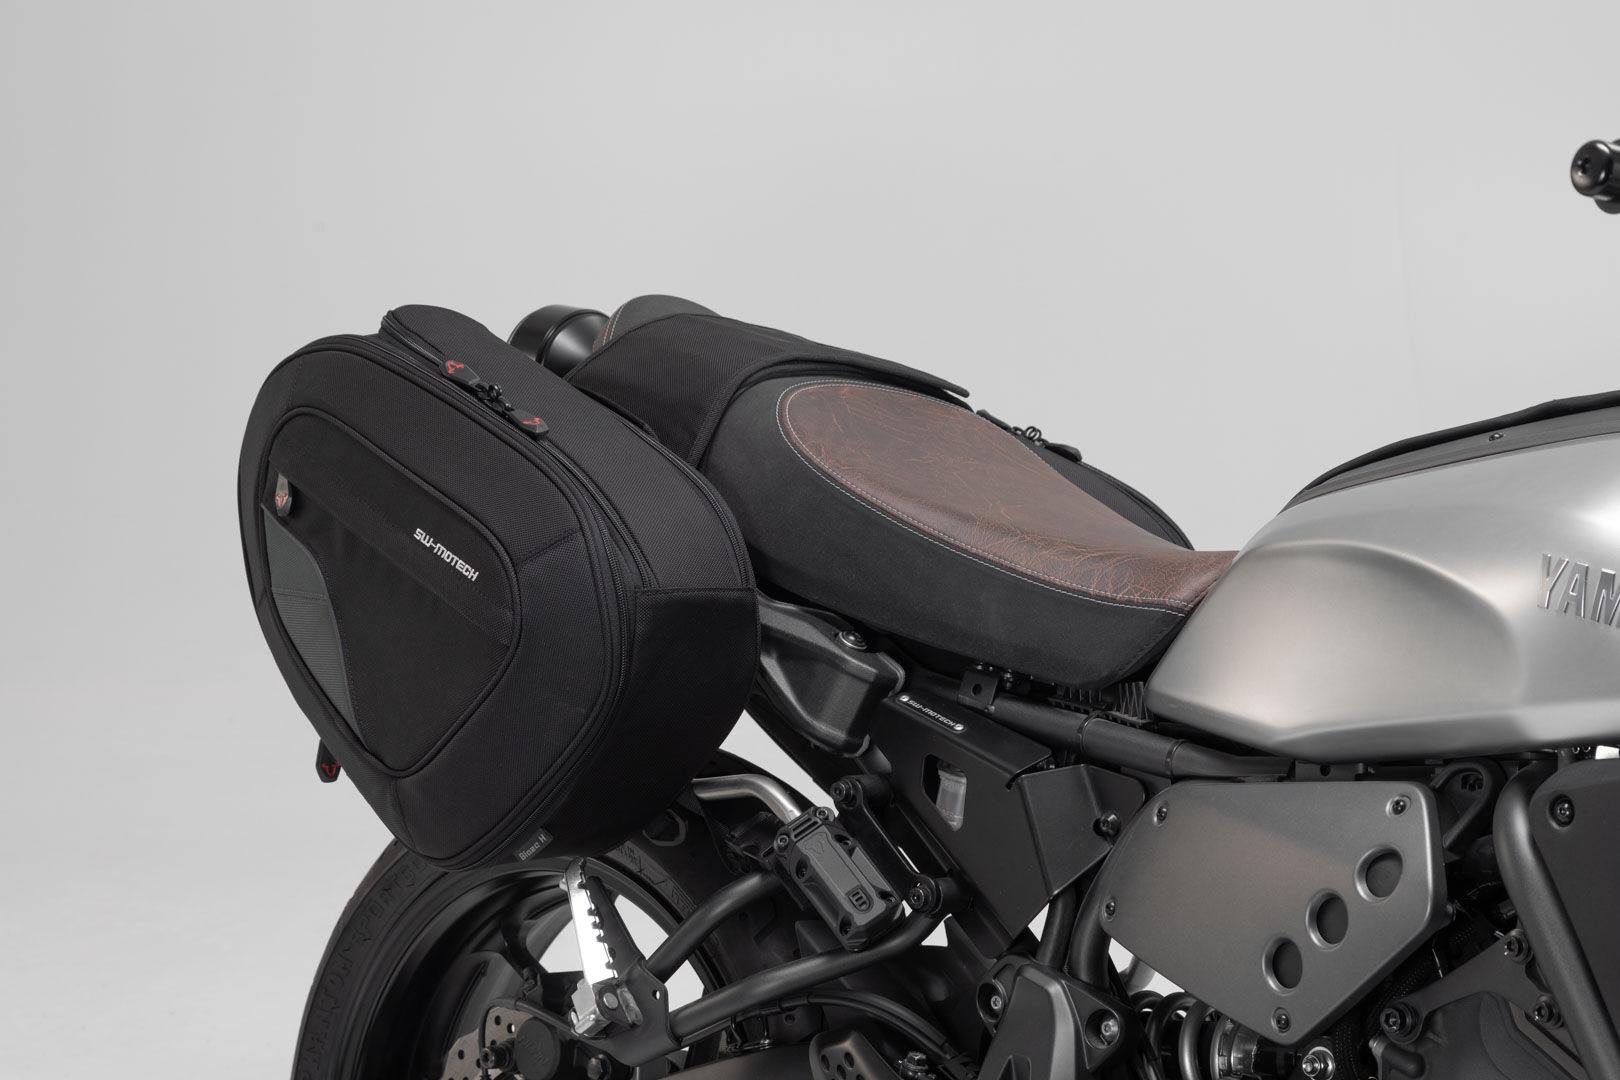 SW-Motech Set de alforjas BLAZE H - Negro/Gris. Yamaha XSR 700 (16-).